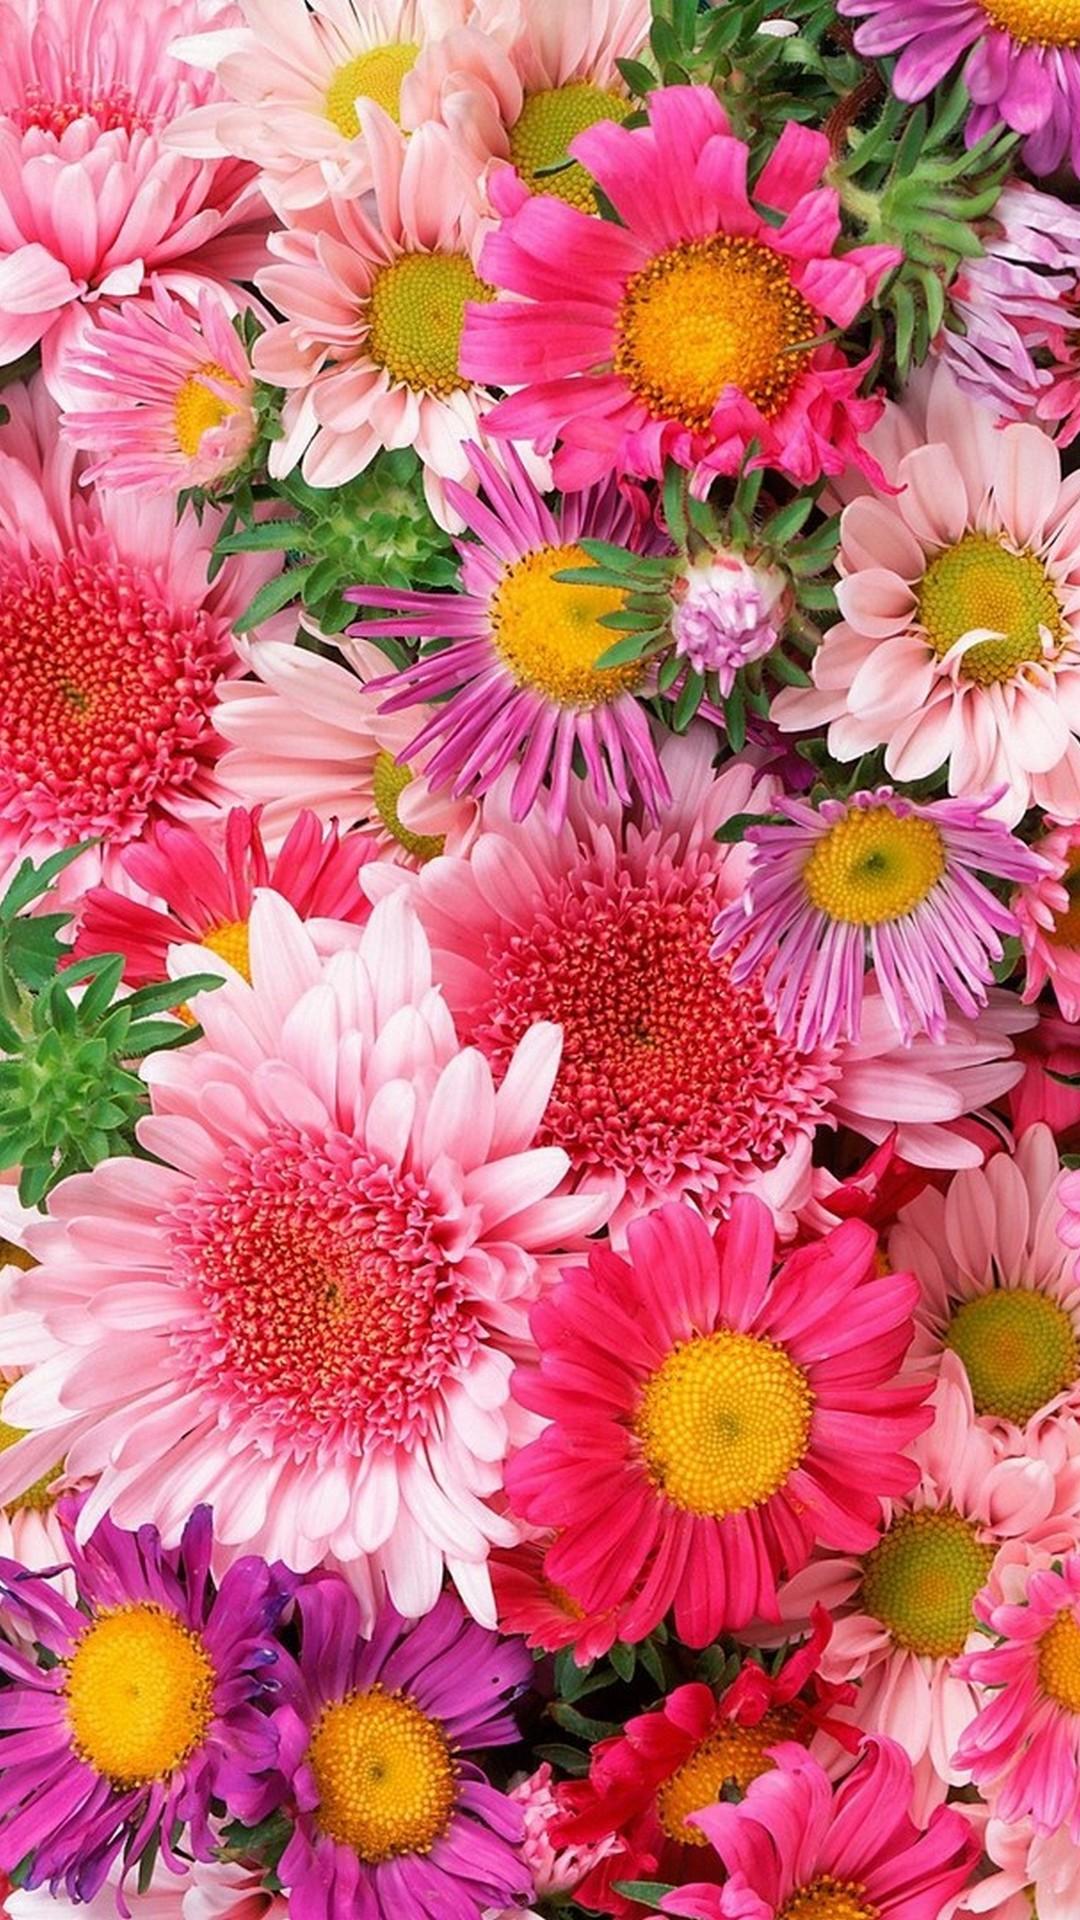 Flower Screensavers Free Download Beautiful Flower 2017